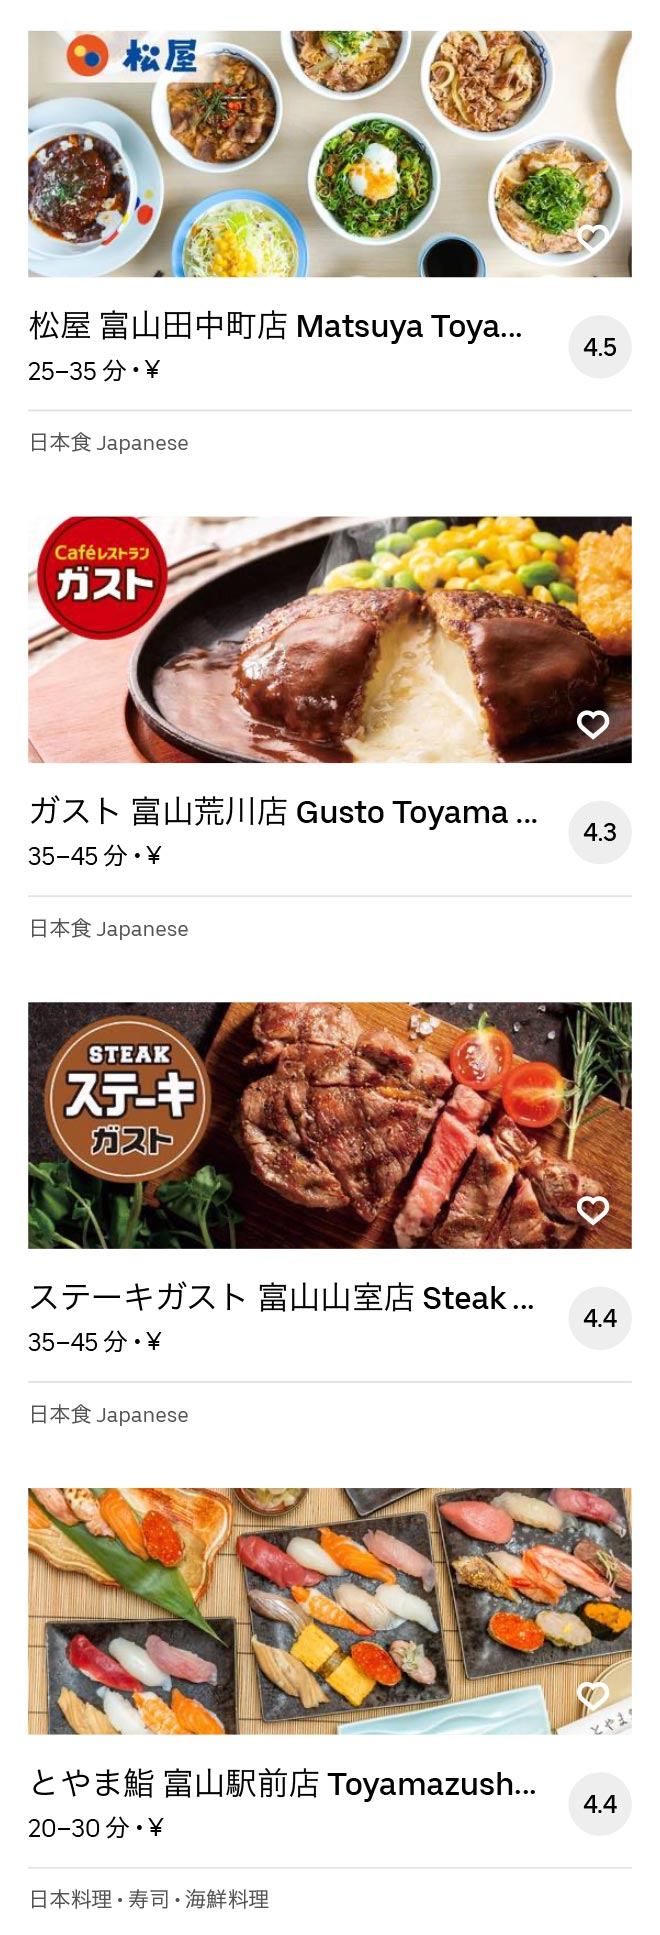 Toyama menu 2009 07